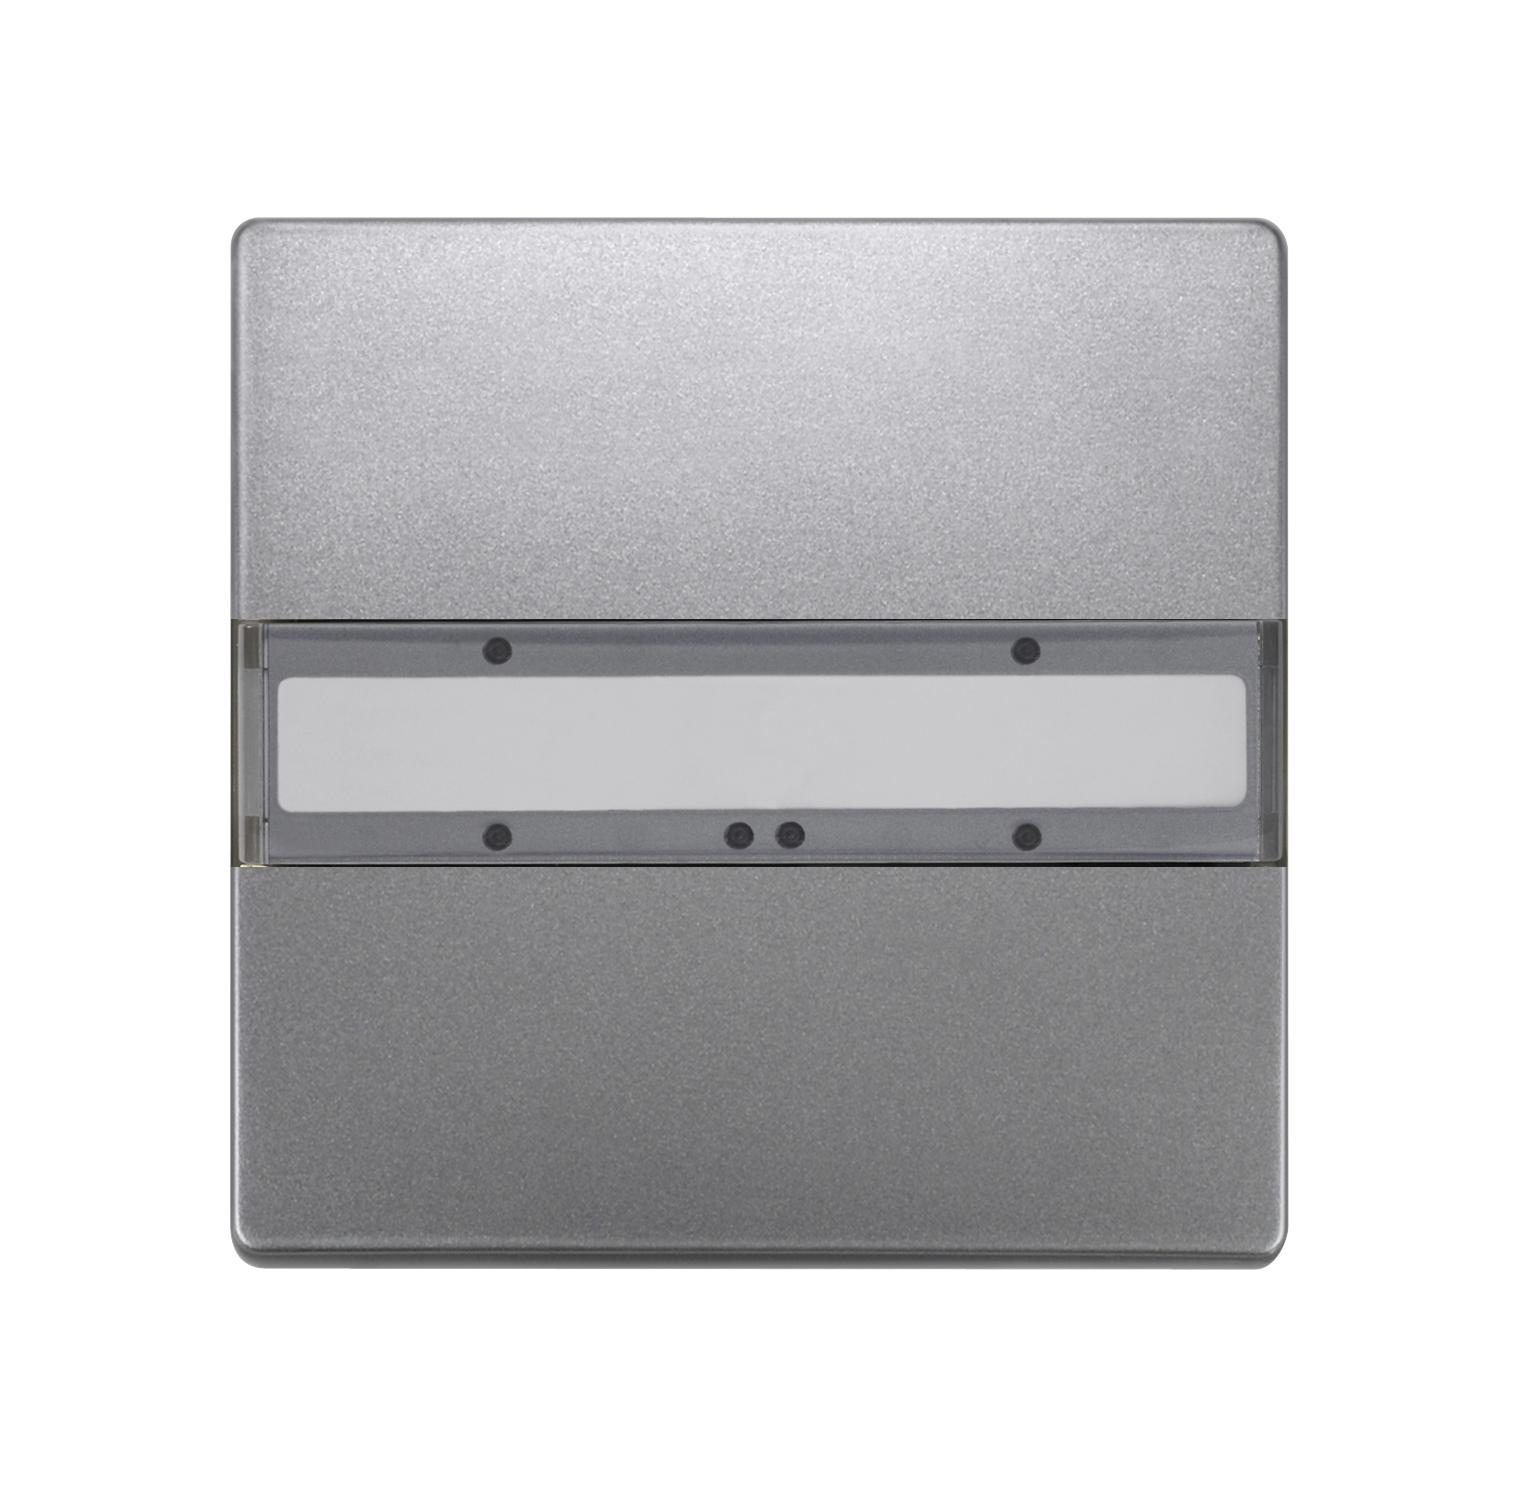 1 Stk Taster 1-fach ohne Status-LED, DELTA style, platinmetallic KX2852DB42